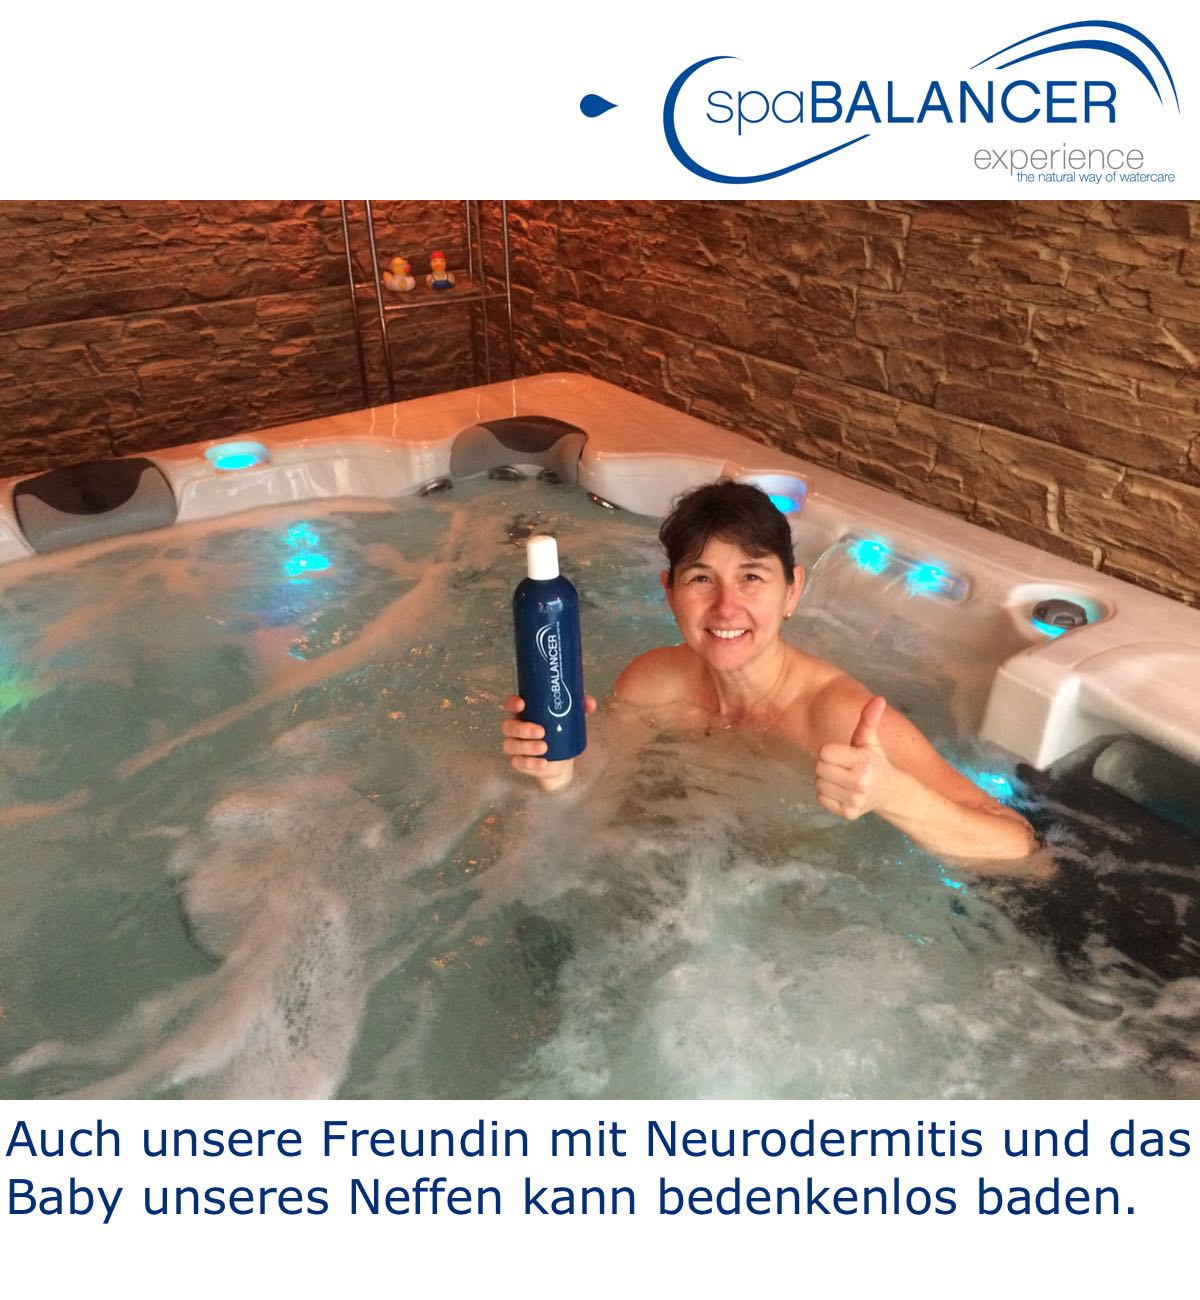 Relativ Baden mit Neurodermitis im Whirlpool ohne Chlor | SpaBalancer CG18